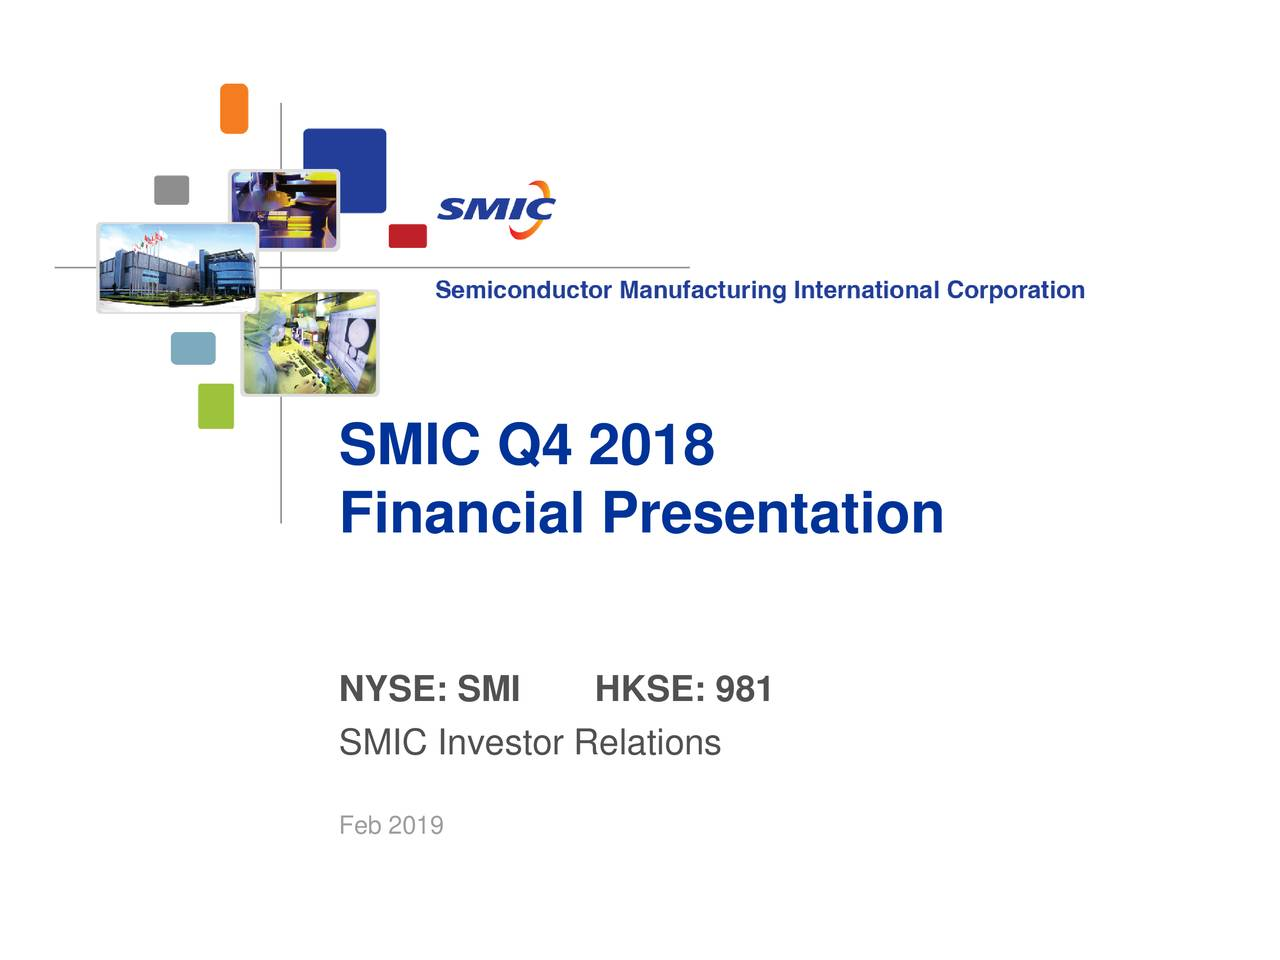 Financial Presentation NYSE: SMI HKSE: 981 SMIC Investor Relations Feb 2019